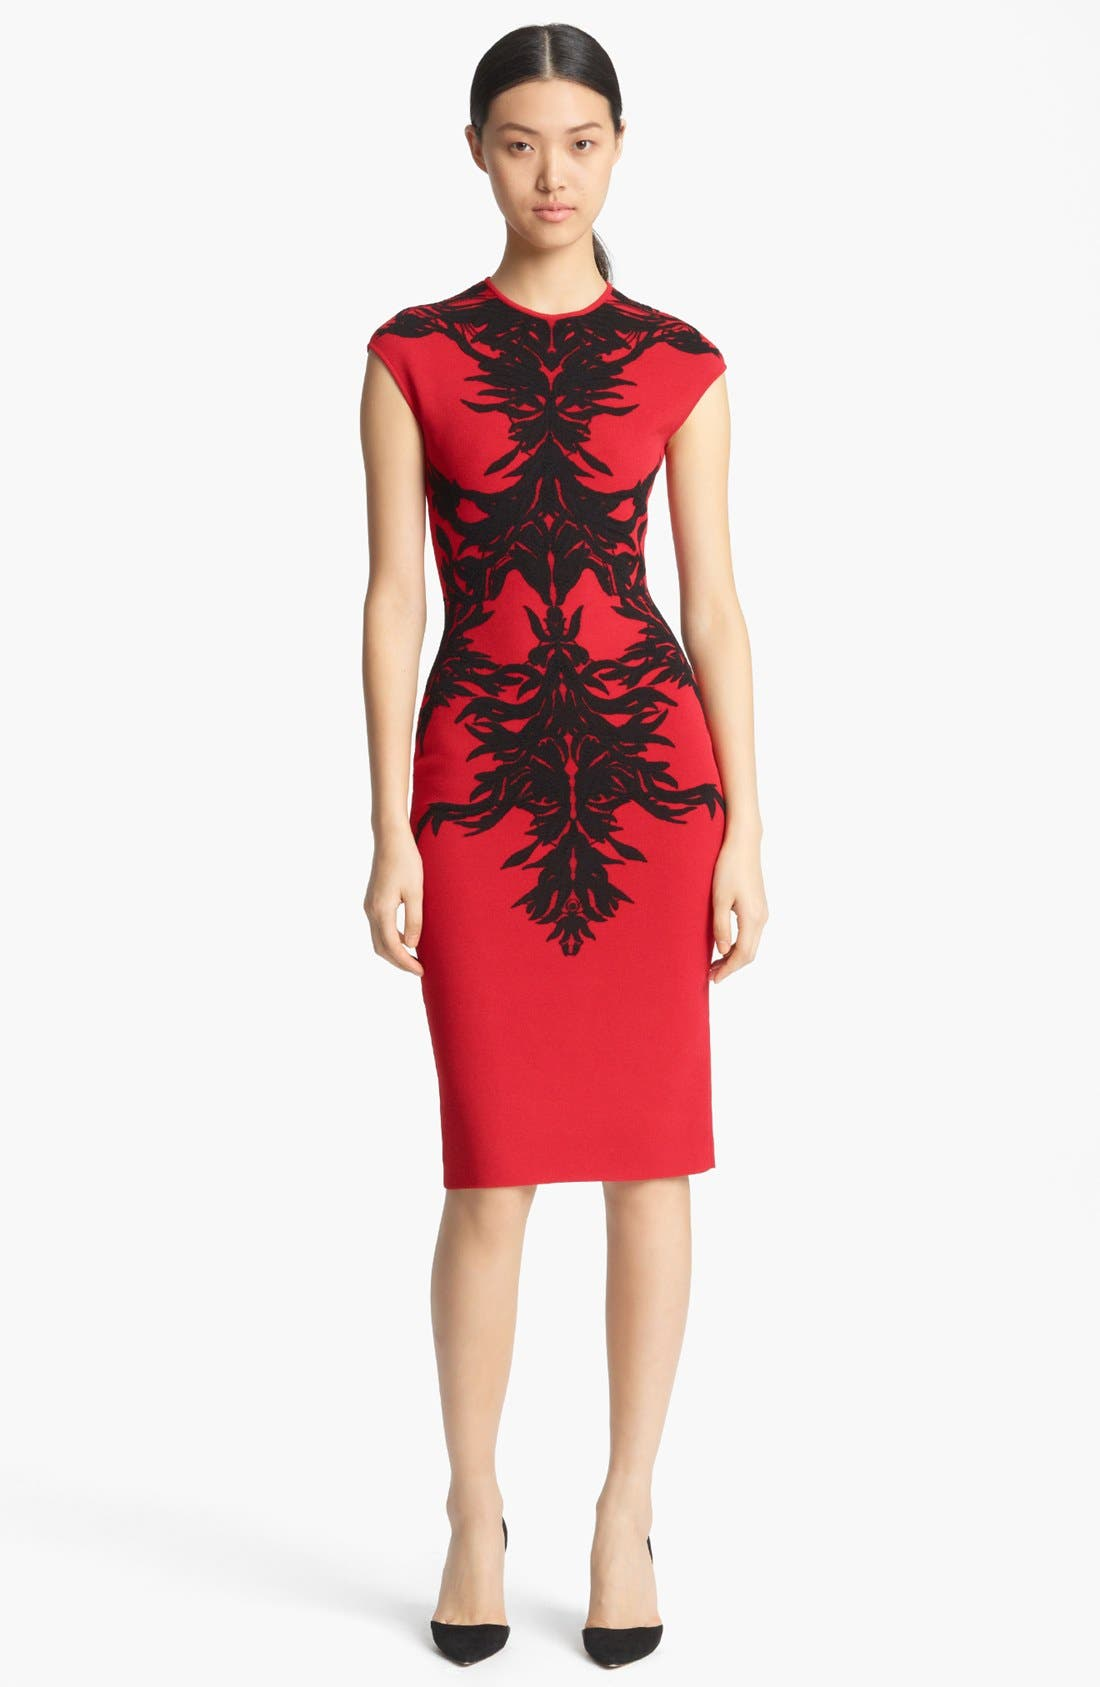 Alternate Image 1 Selected - Alexander McQueen Spine Print Intarsia Knit Dress